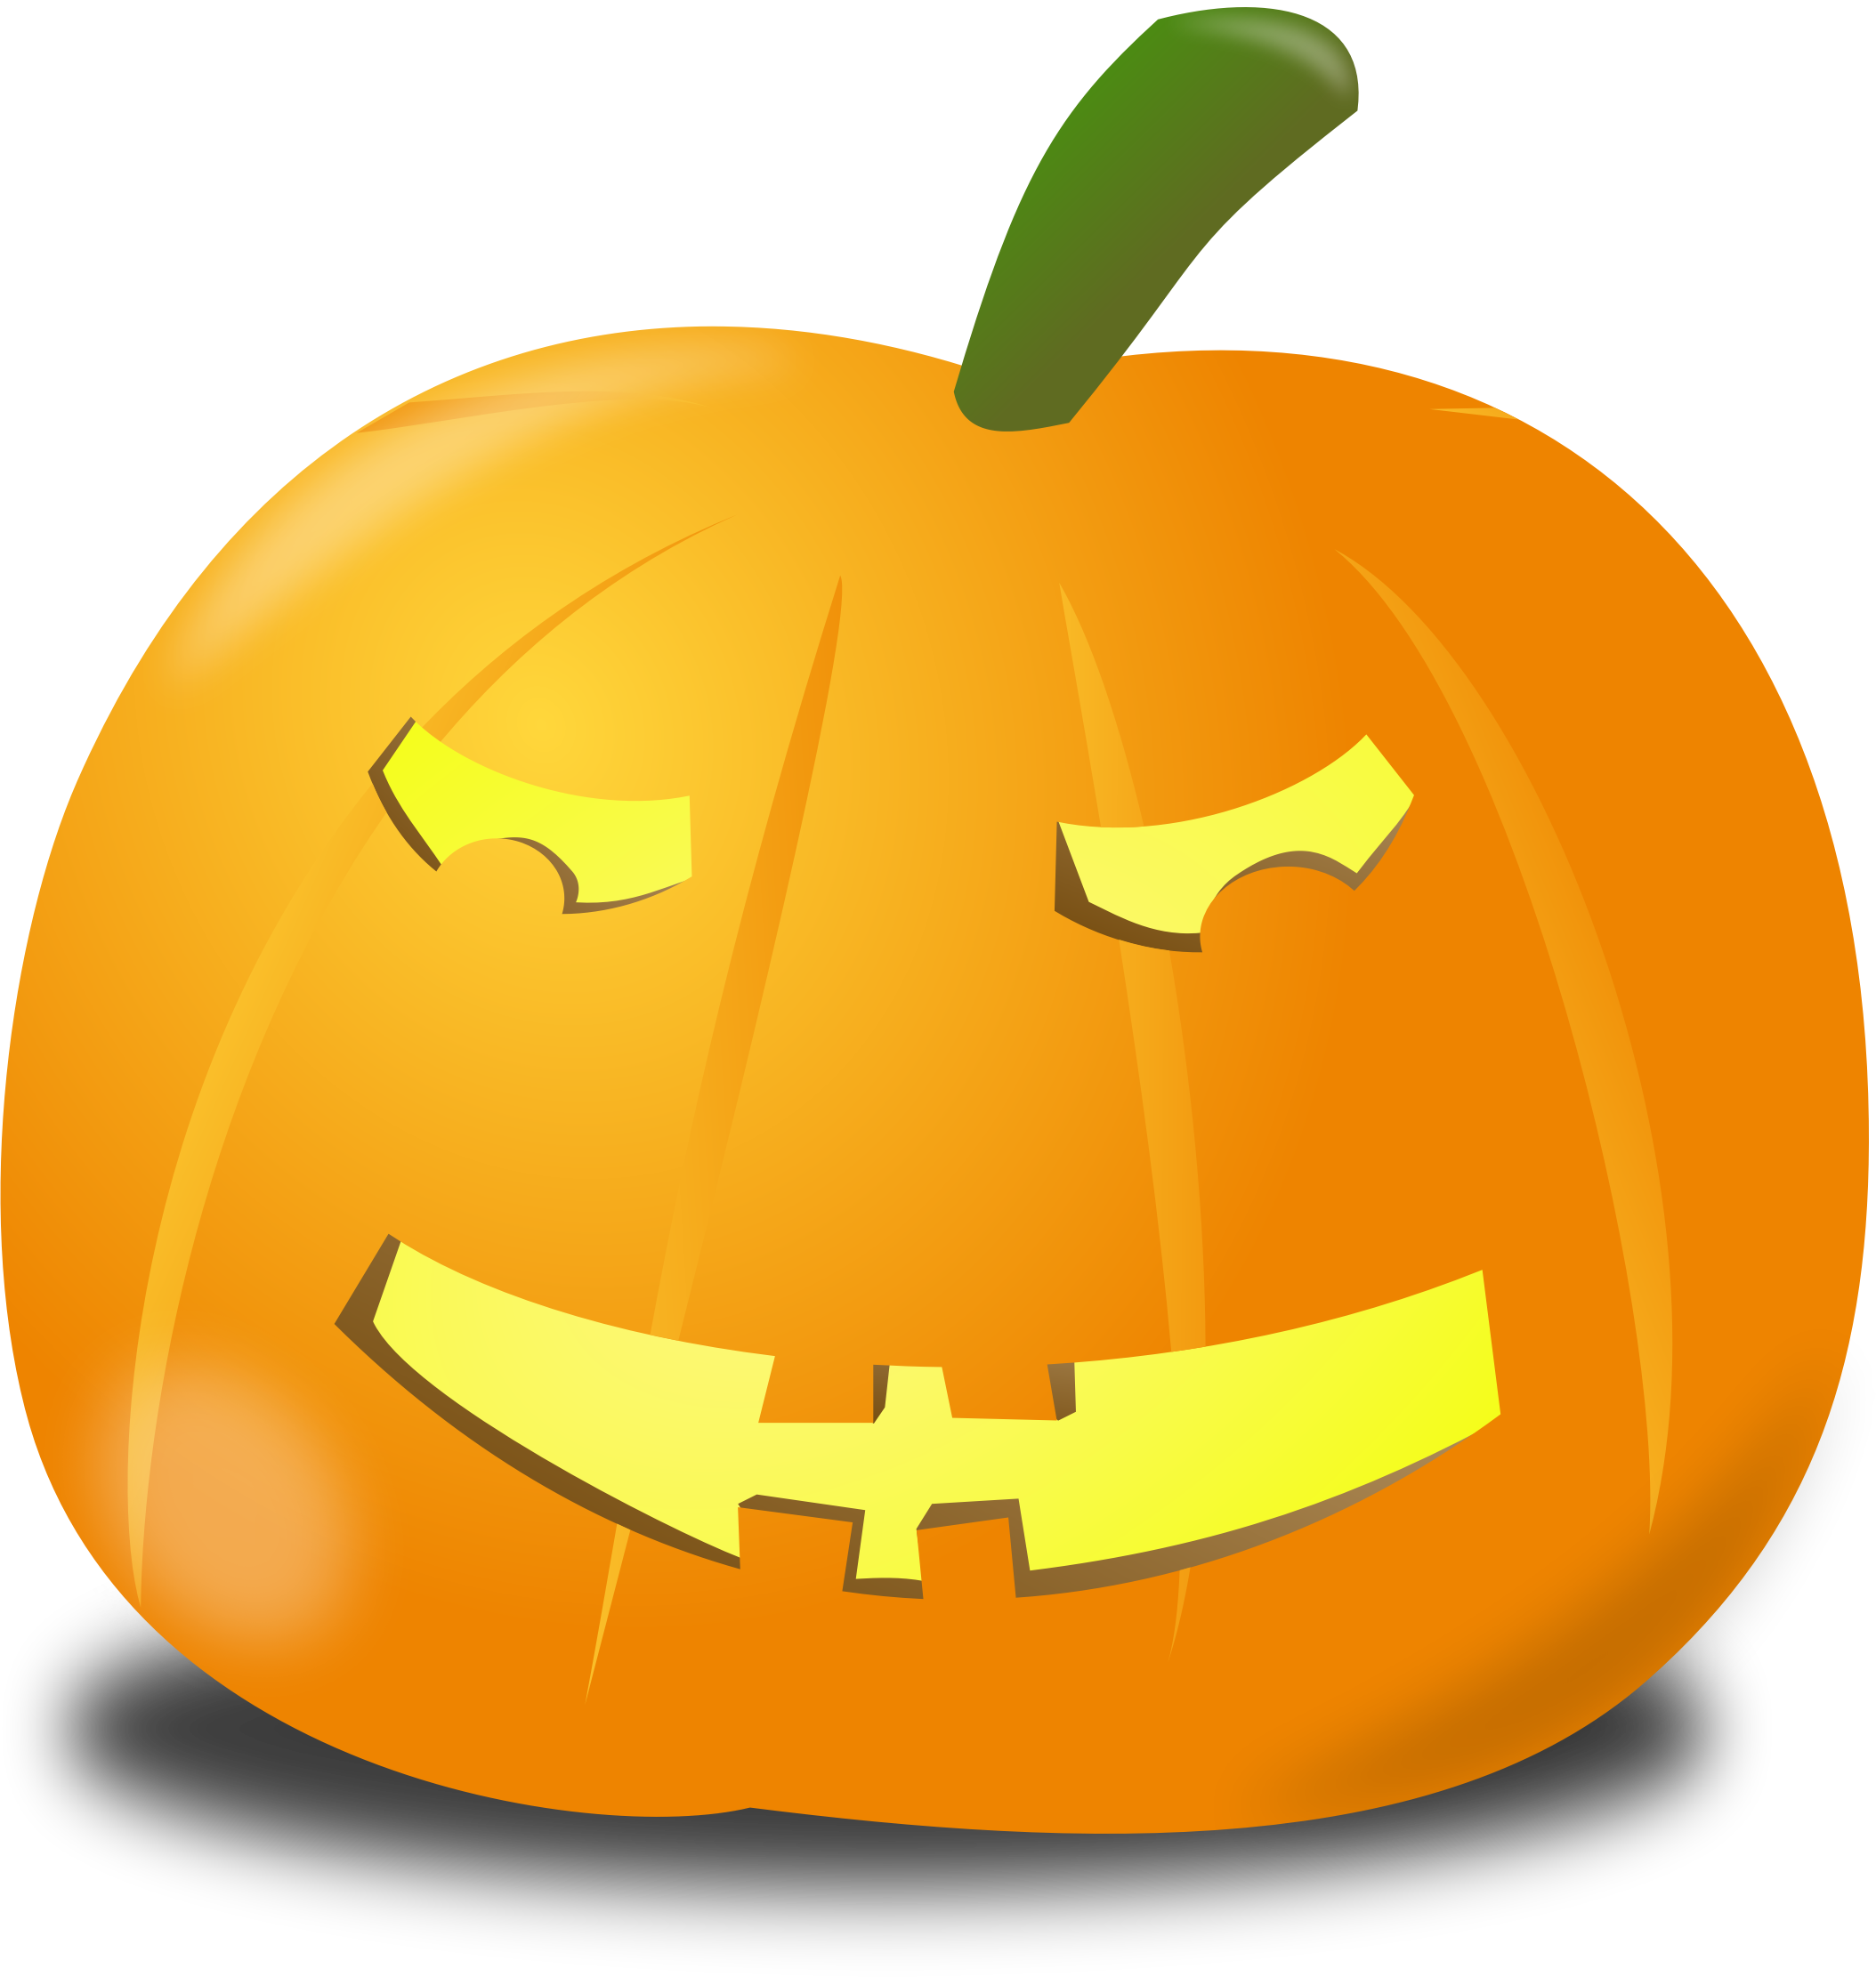 Free pumpkin pictures clip art 7,609 Free Flower Clip Art Images